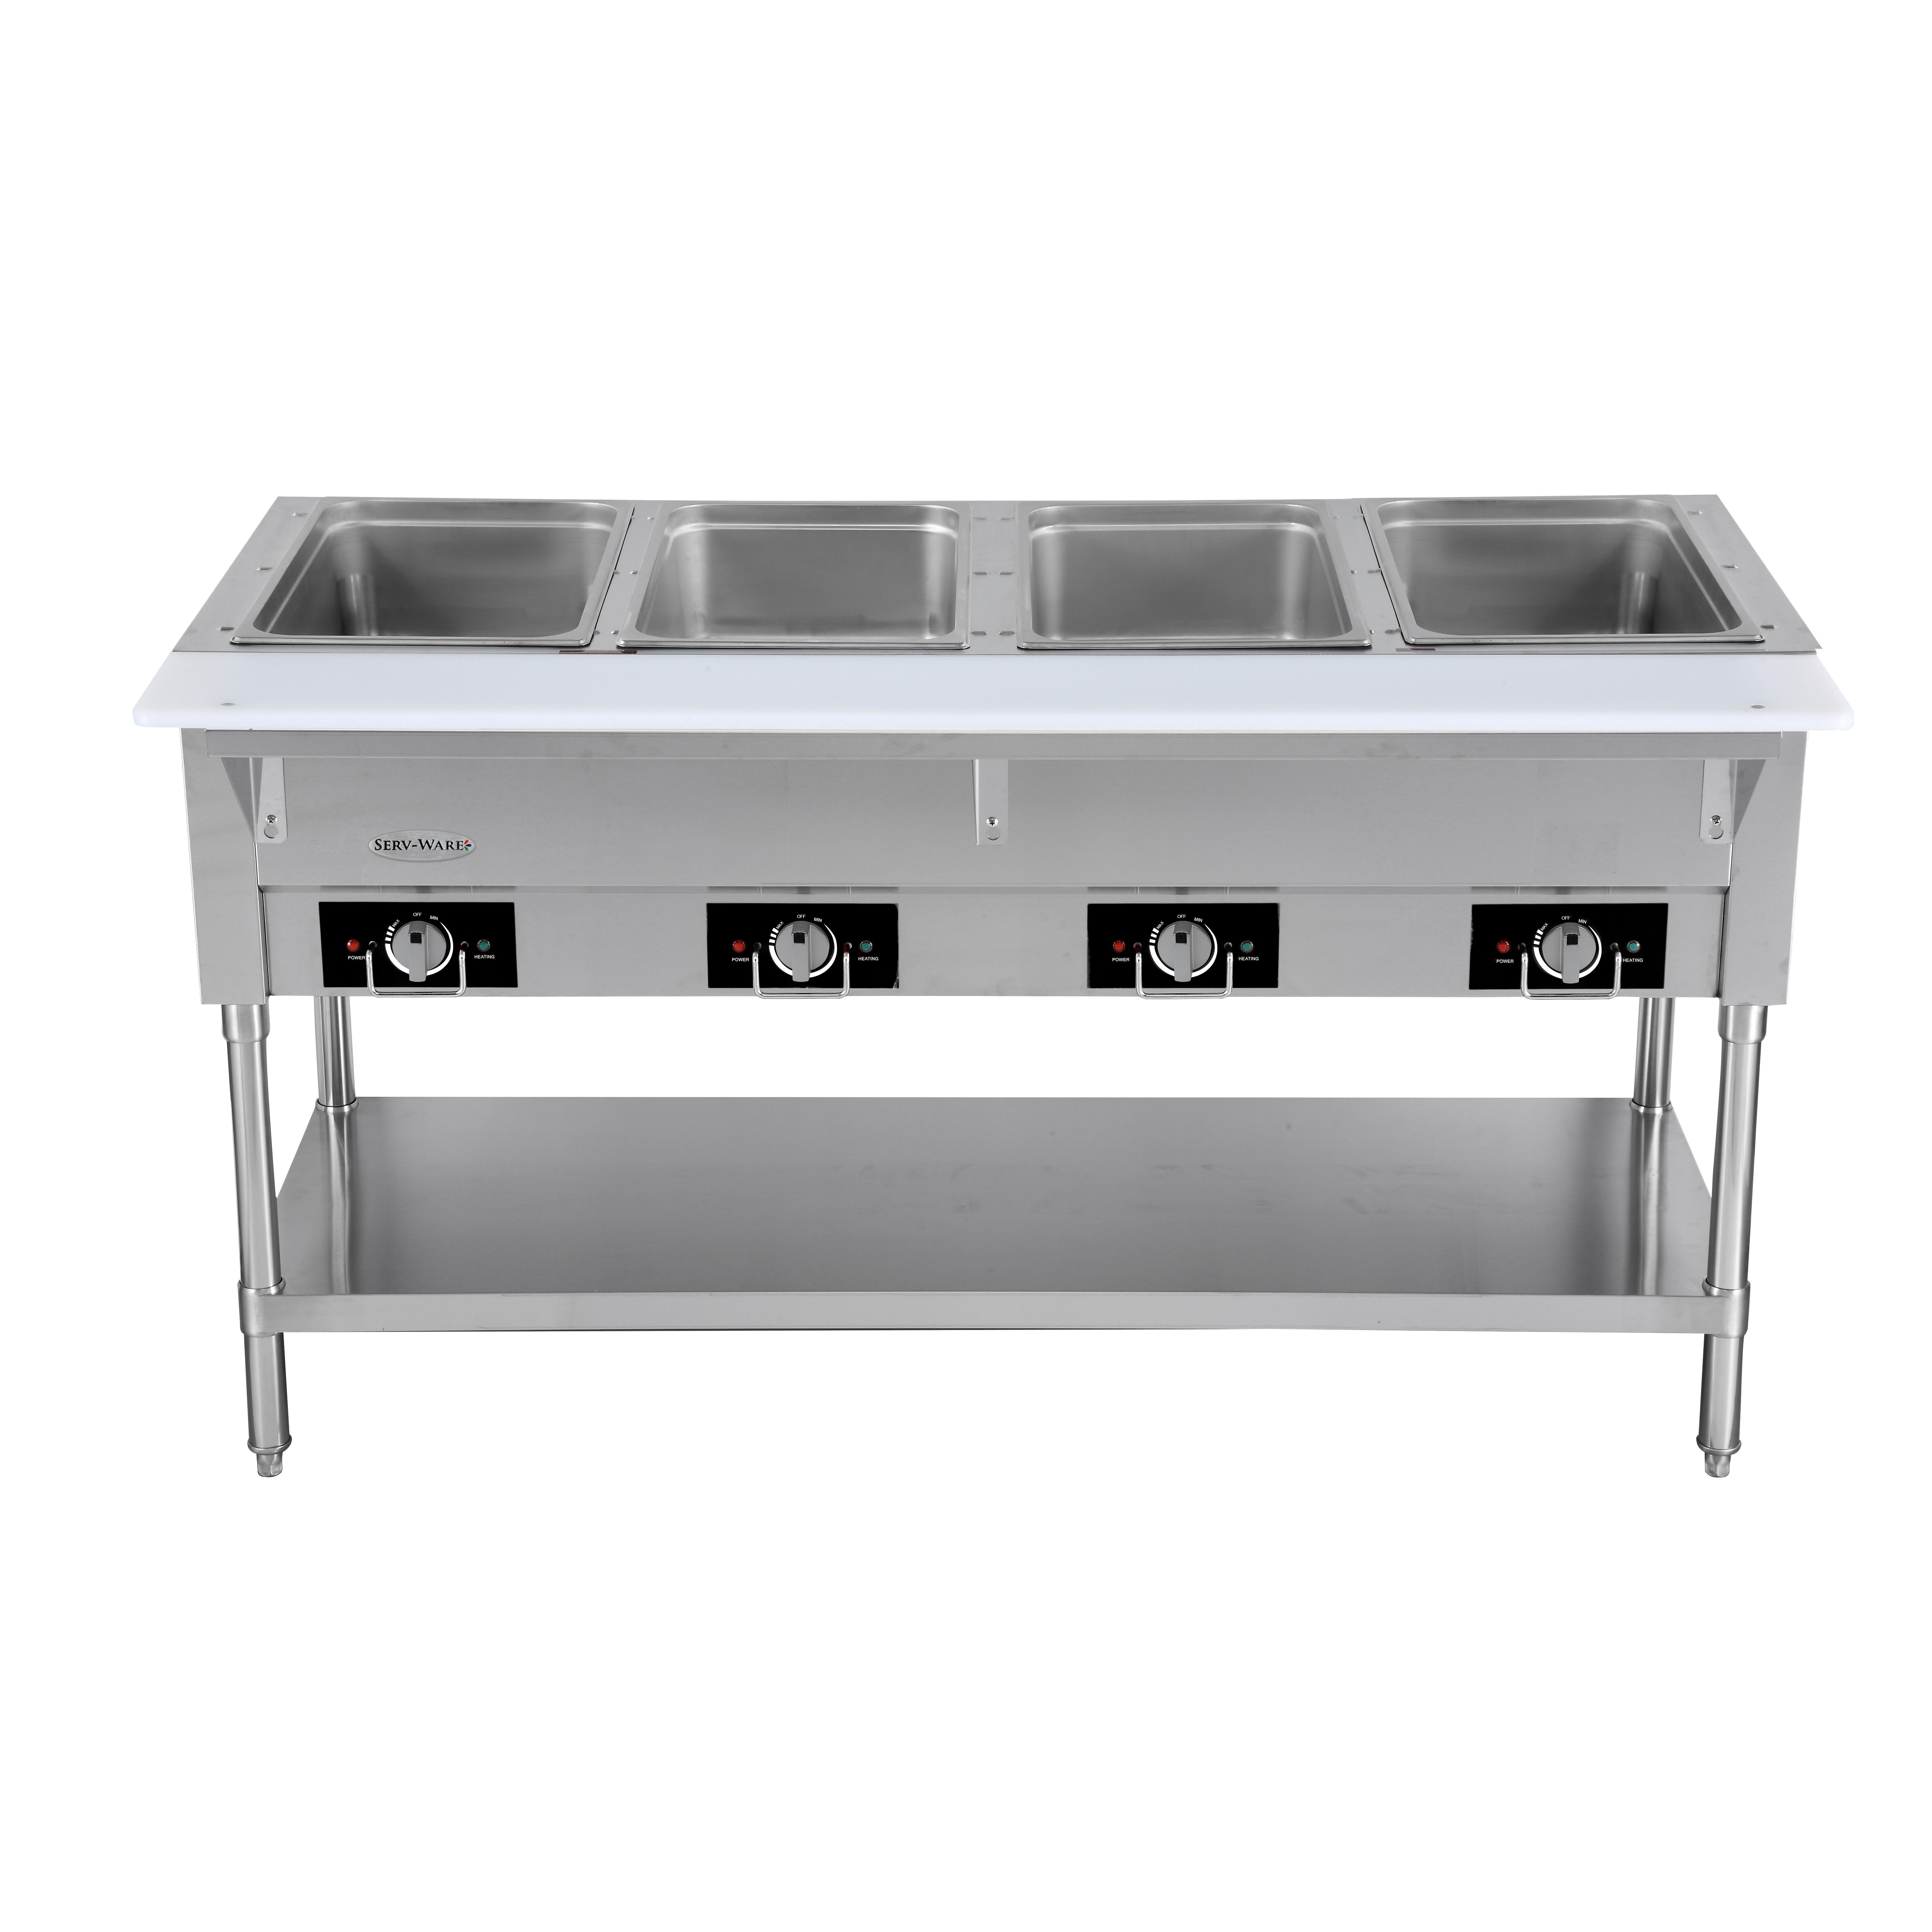 Serv-Ware EST4-2 serving counter, hot food, electric